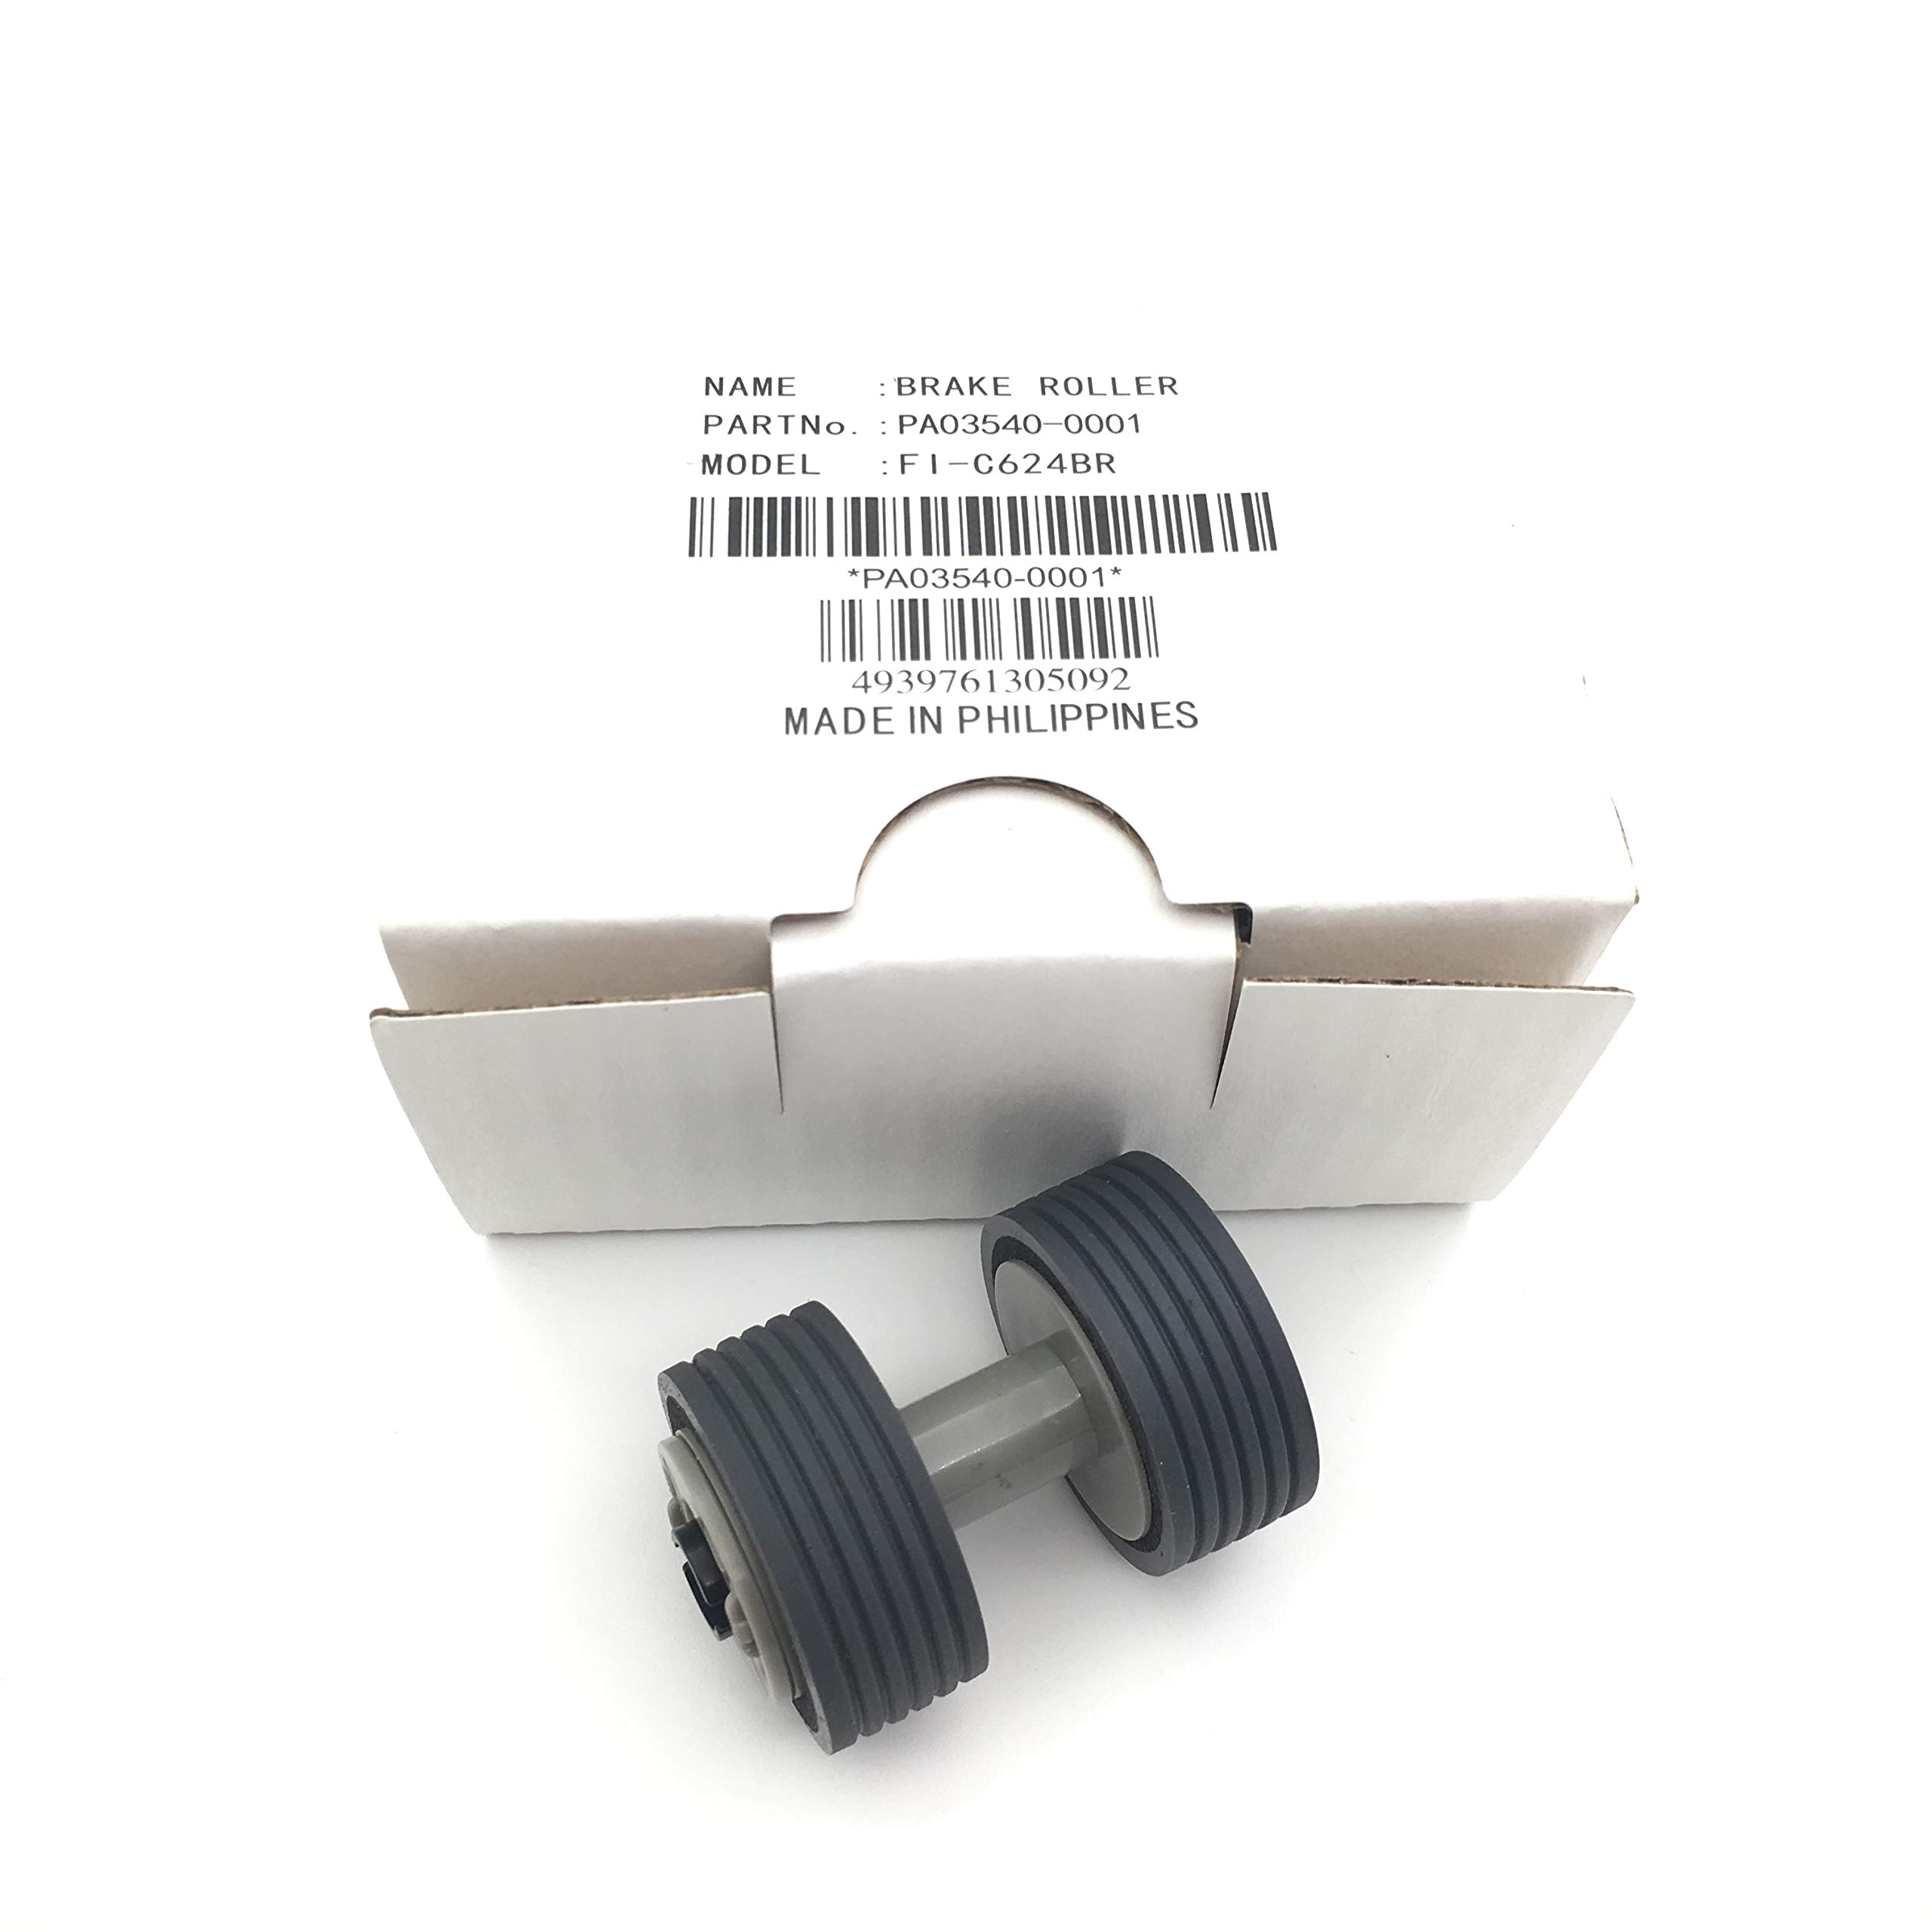 OKLILI PA03540-0001 Brake Roller for Fujitsu fi-6130 fi-6230 fi-6130Z fi-6125 fi-6230Z fi-6140 fi-6140Z fi-6240 fi-6240Z fi-6225 IX500